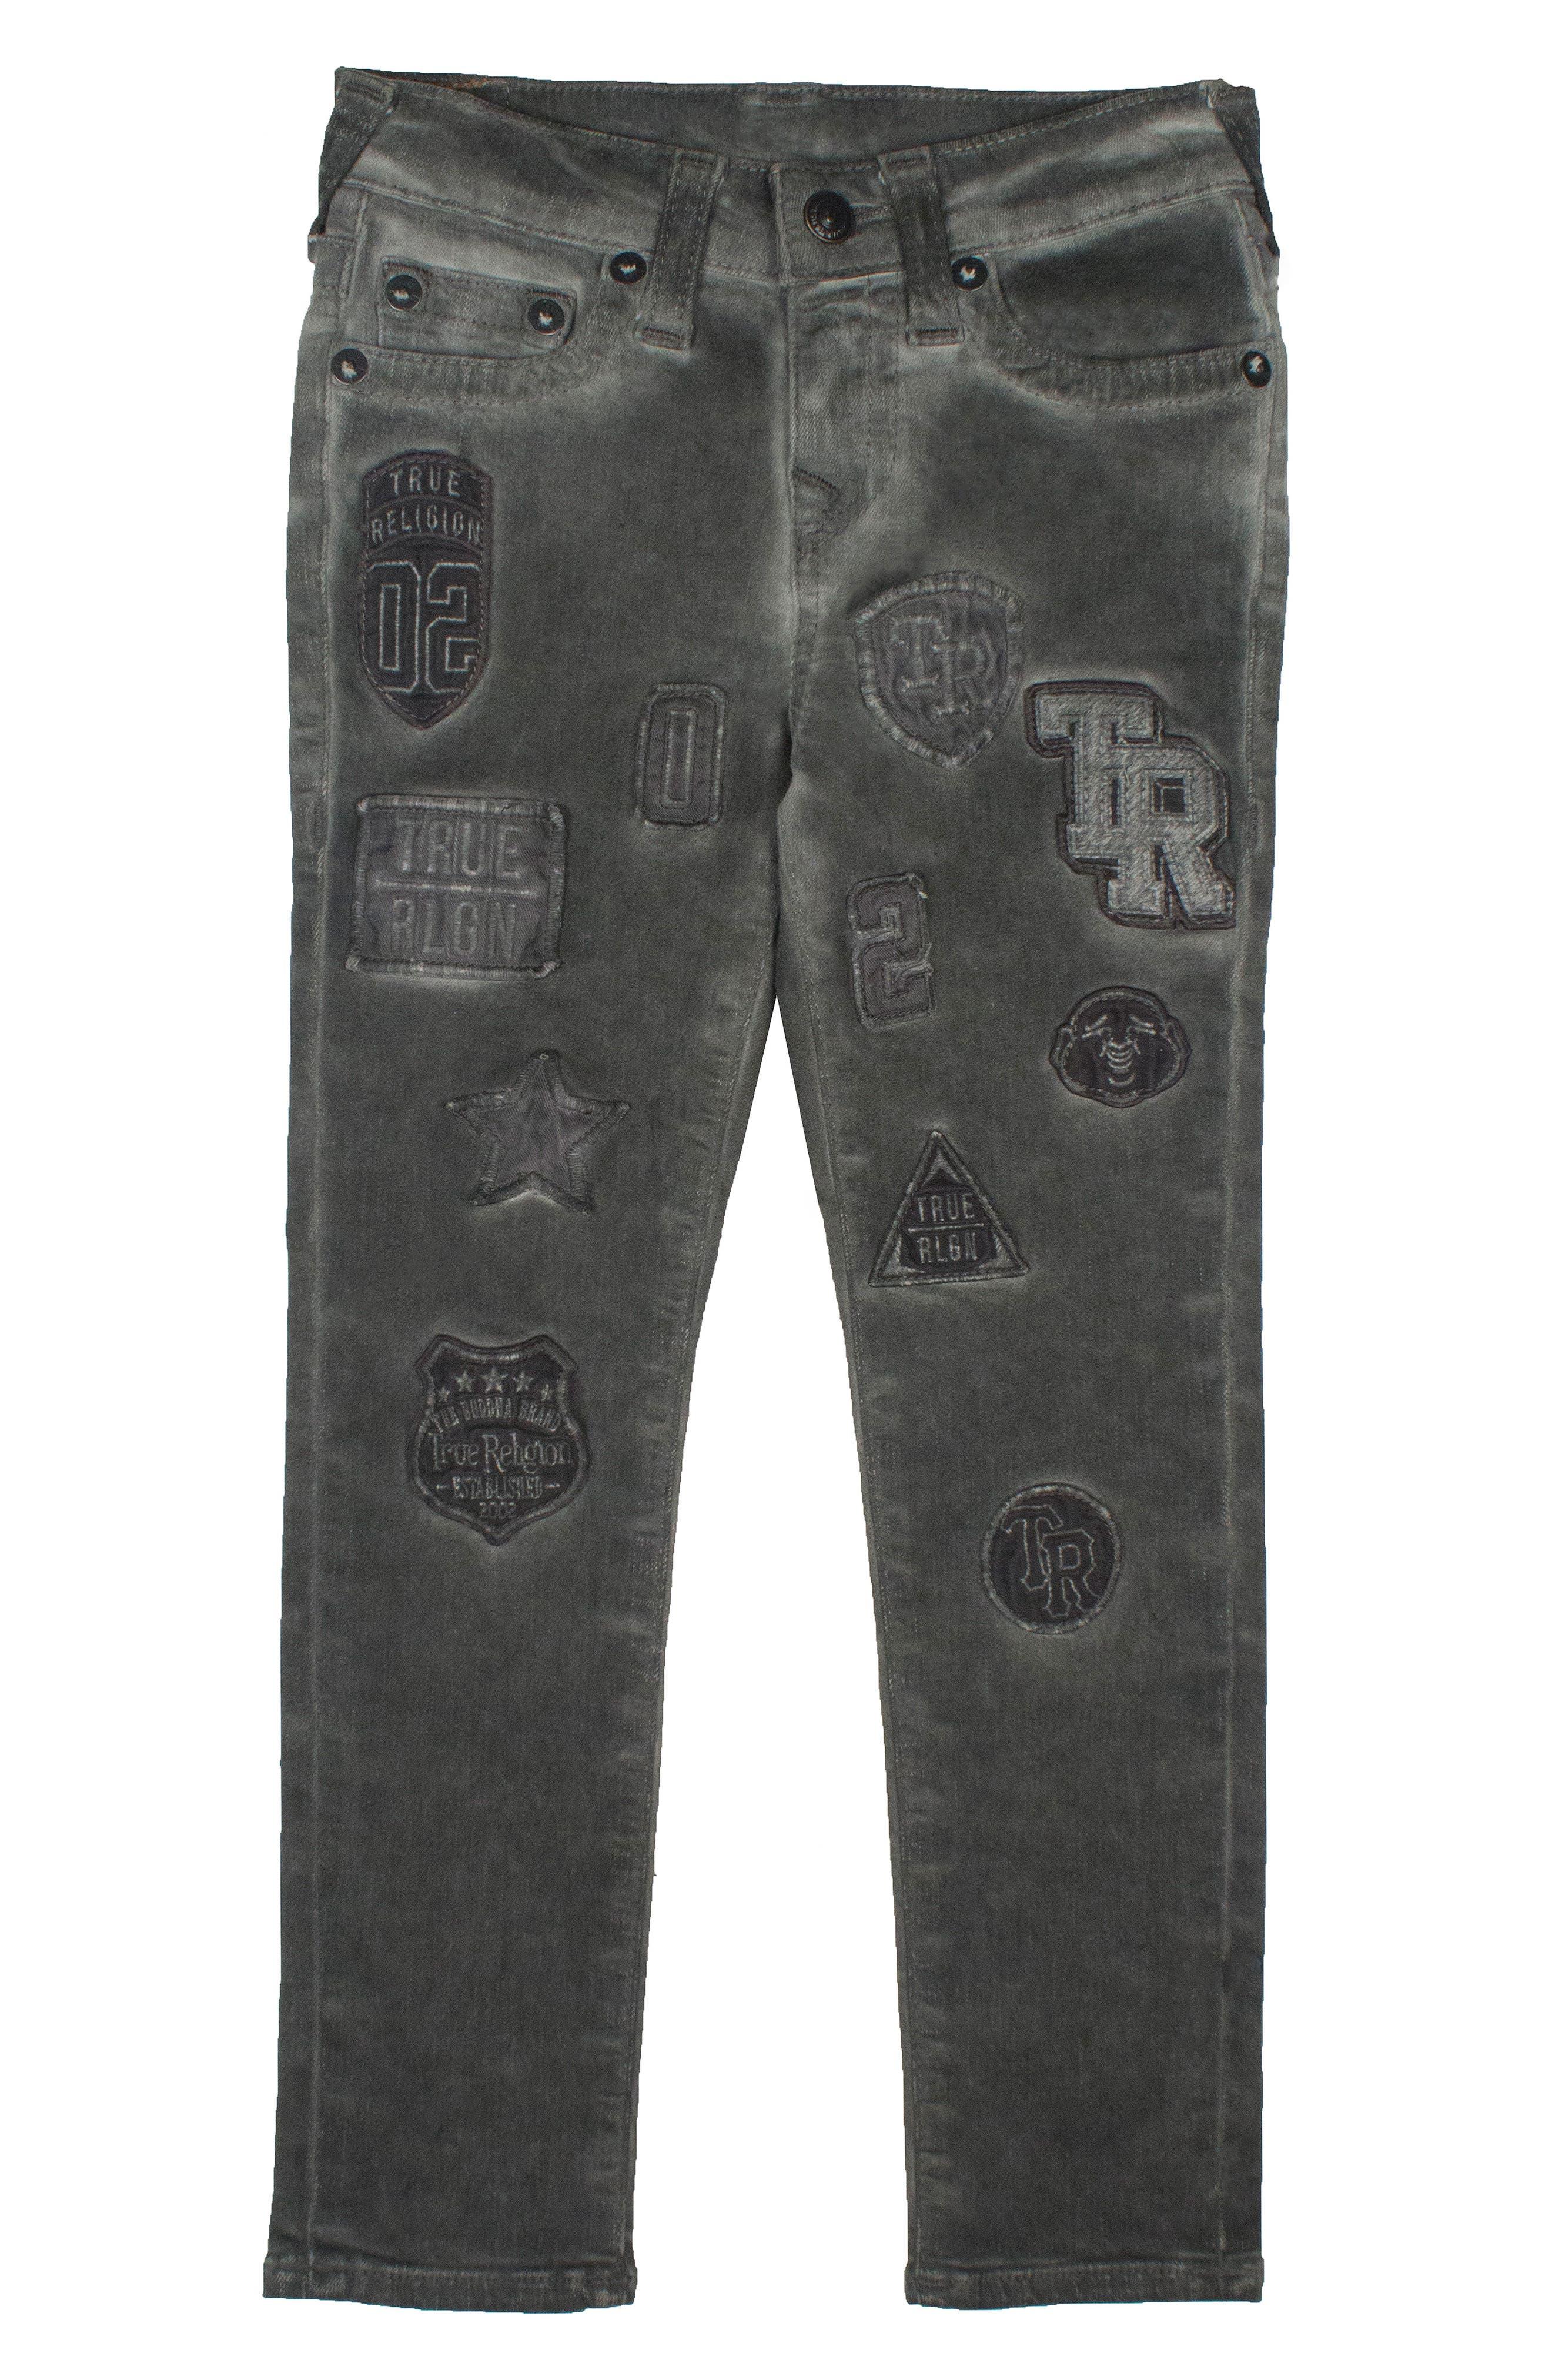 True Religion Brand Jeans Rocco Single End Jeans (Big Boys)